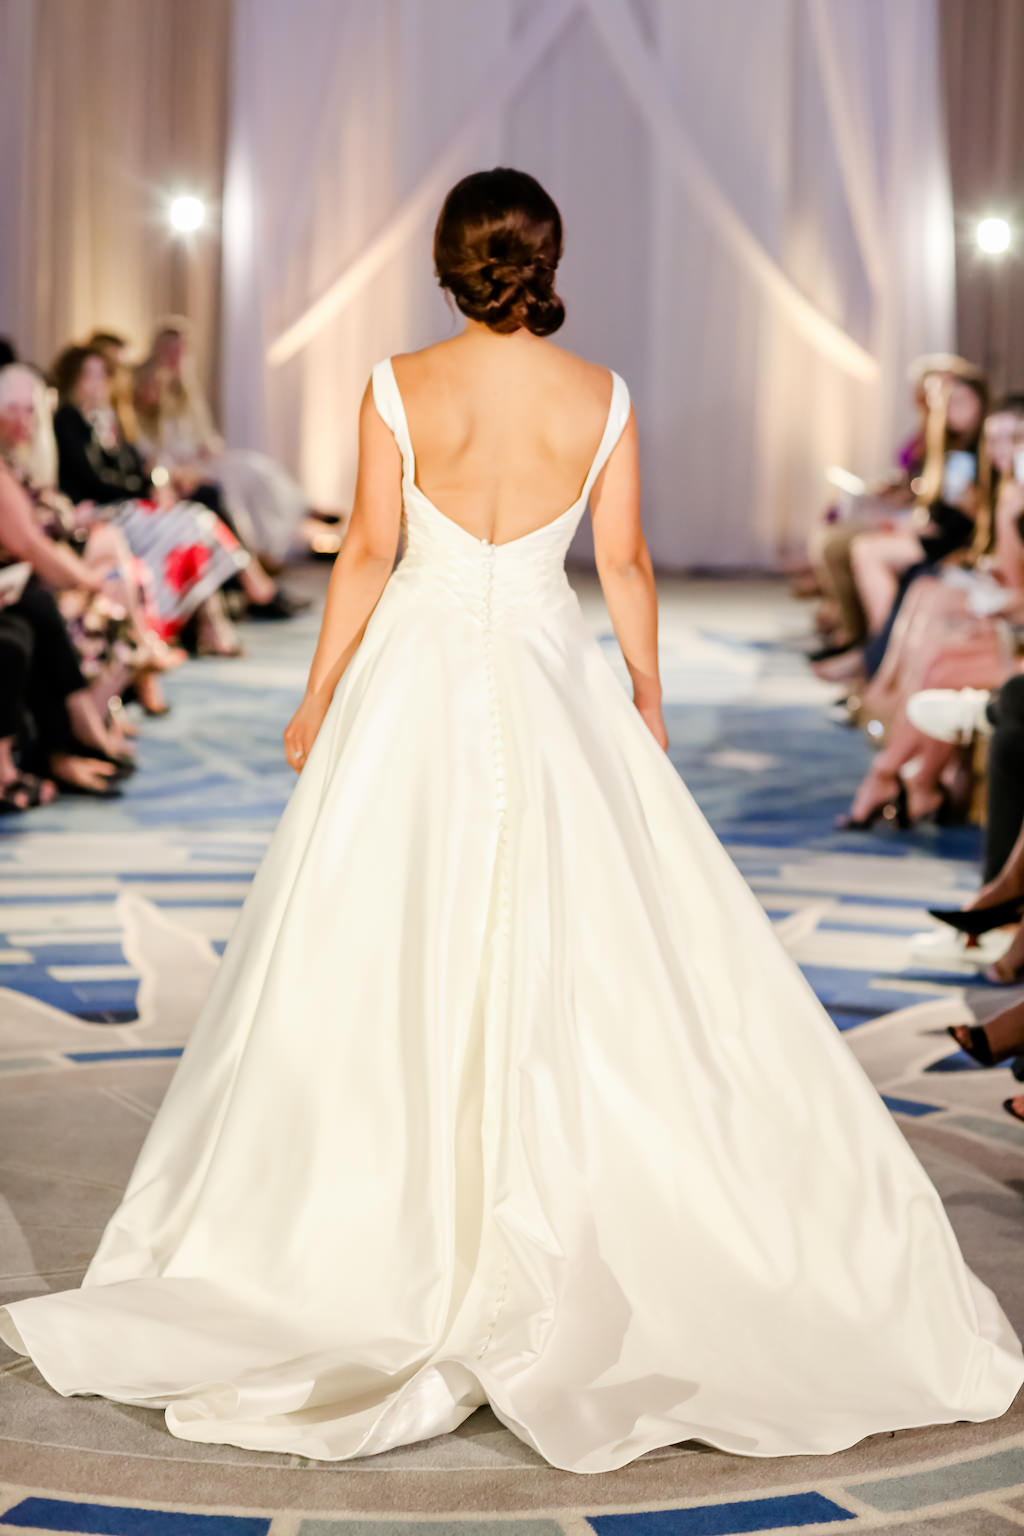 Clean, White, Ball Gown Style Wedding Dress, Open-Back   Designer Matthew Christopher   Truly Forever Bridal   The Ritz Carlton Sarasota   Planner NK Weddings